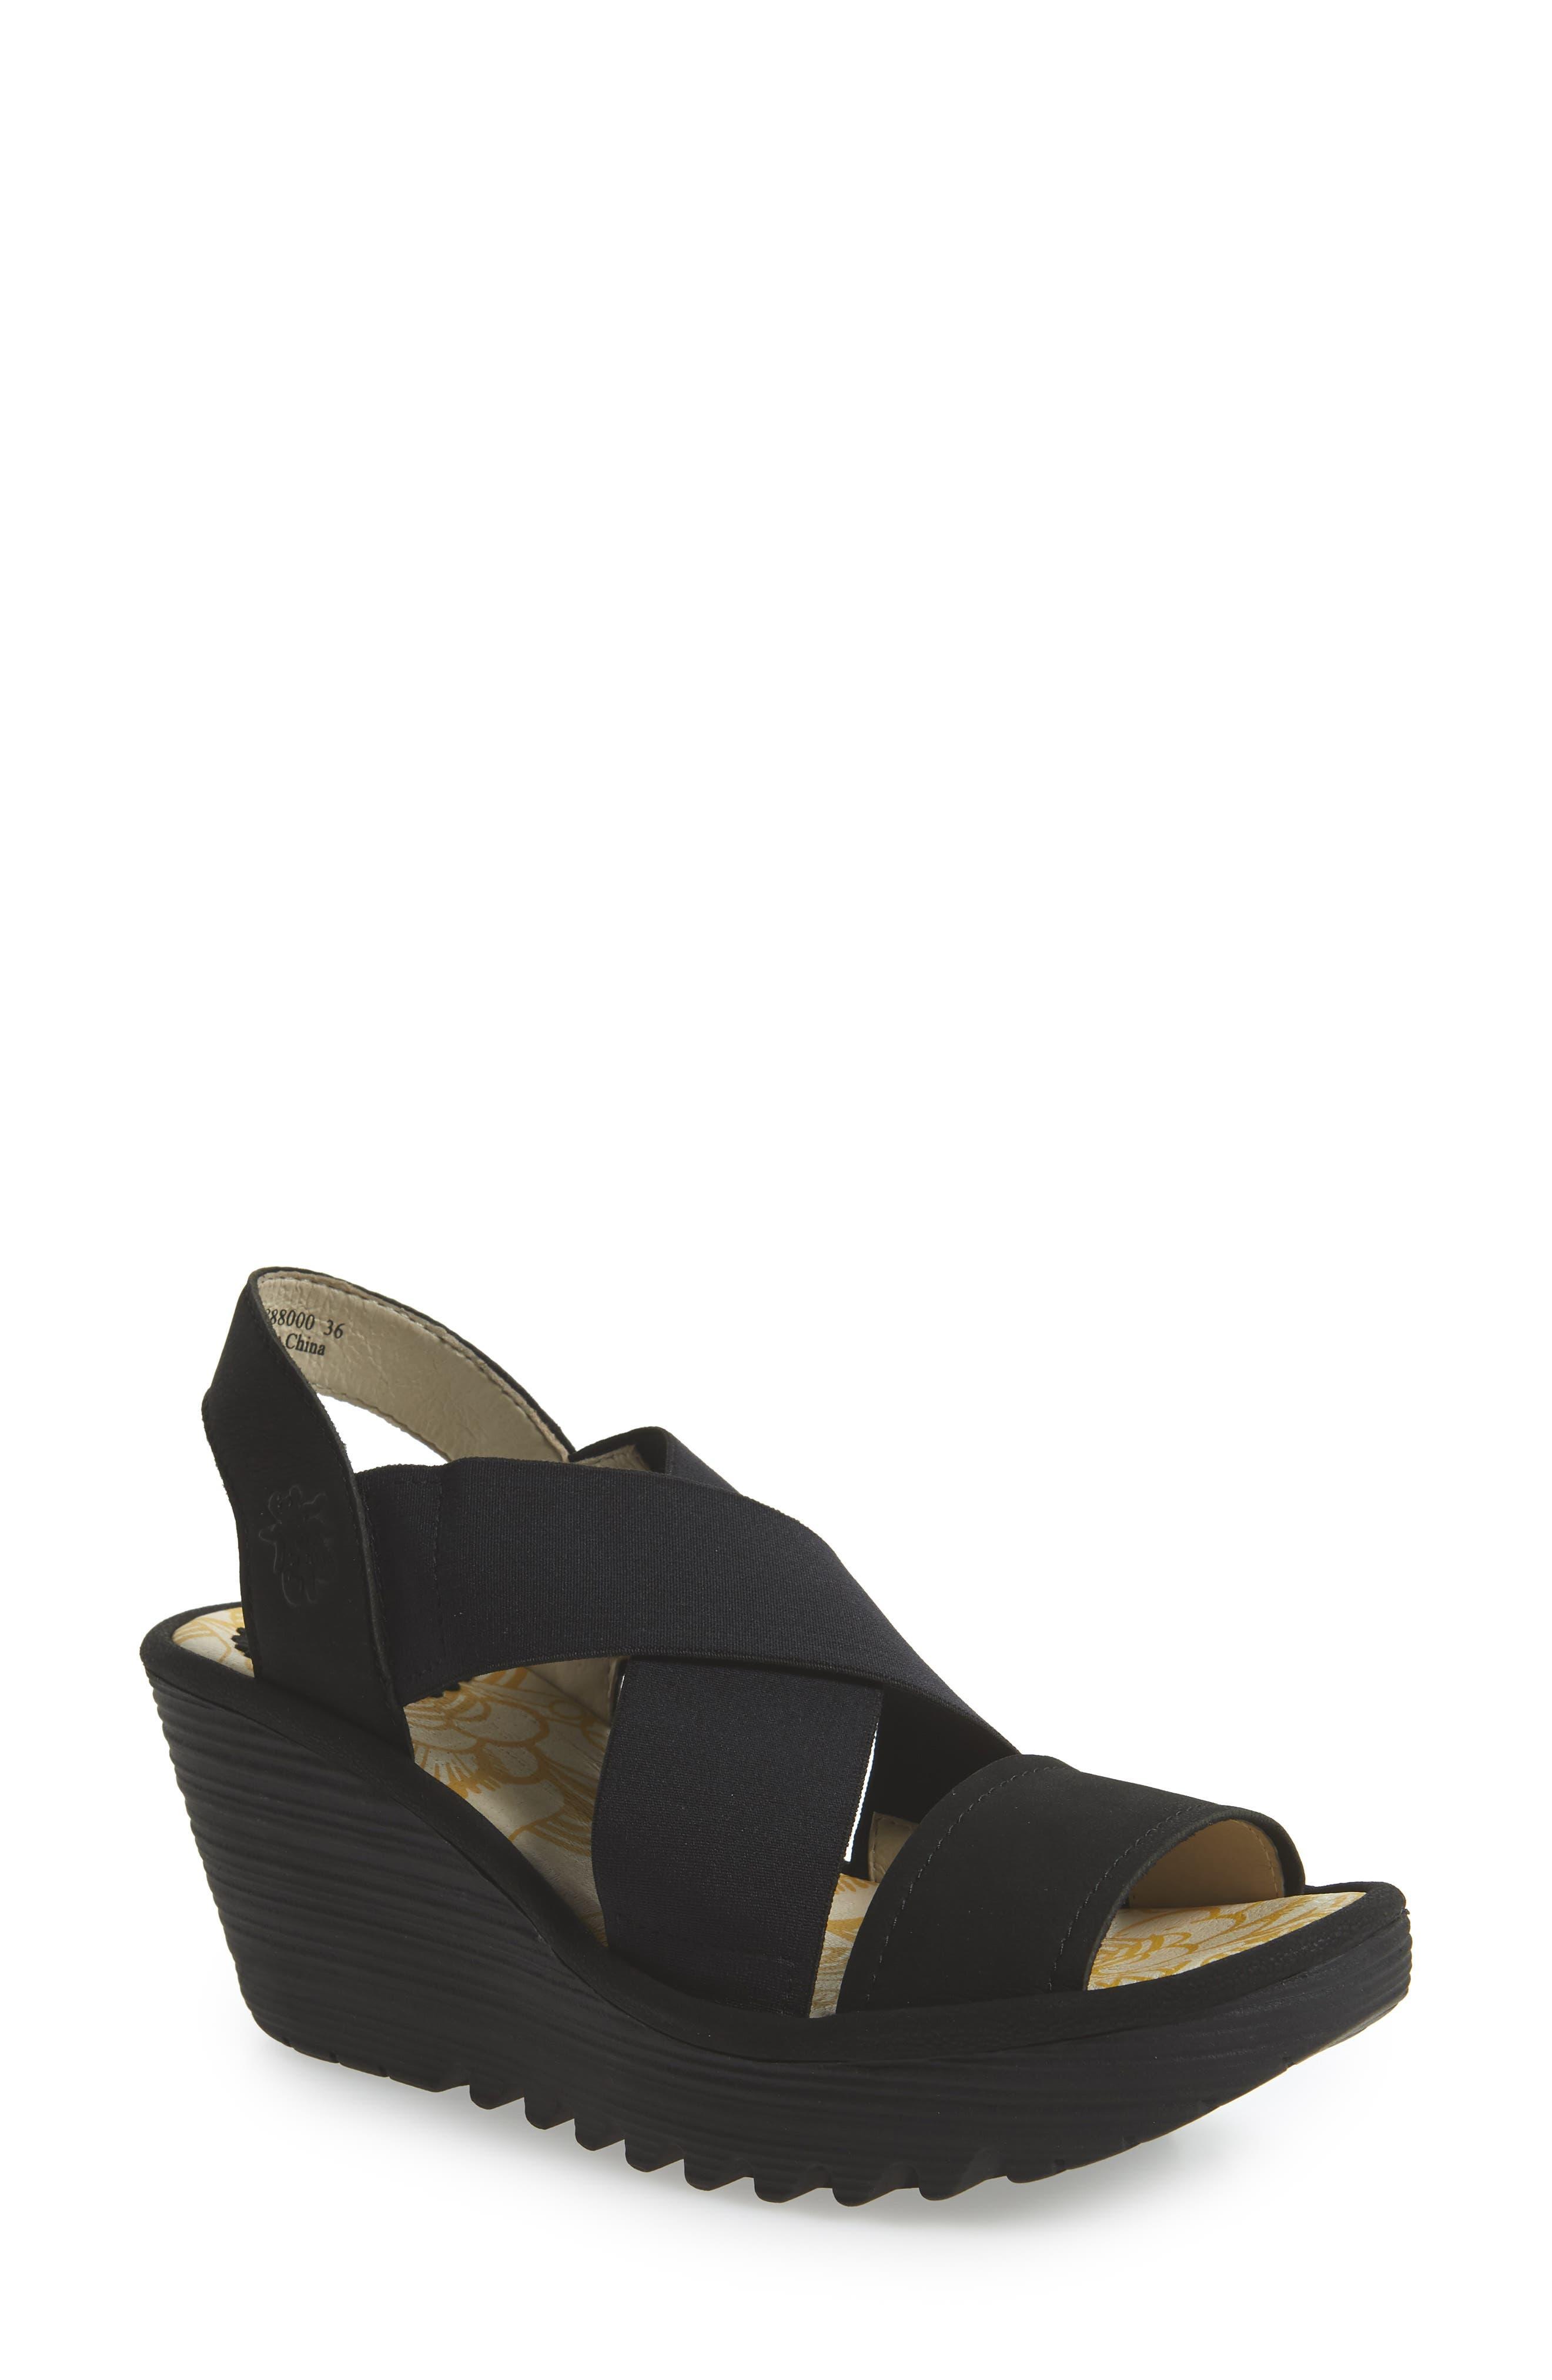 Yaji Cross Wedge Sandal,                         Main,                         color, BLACK LEATHER